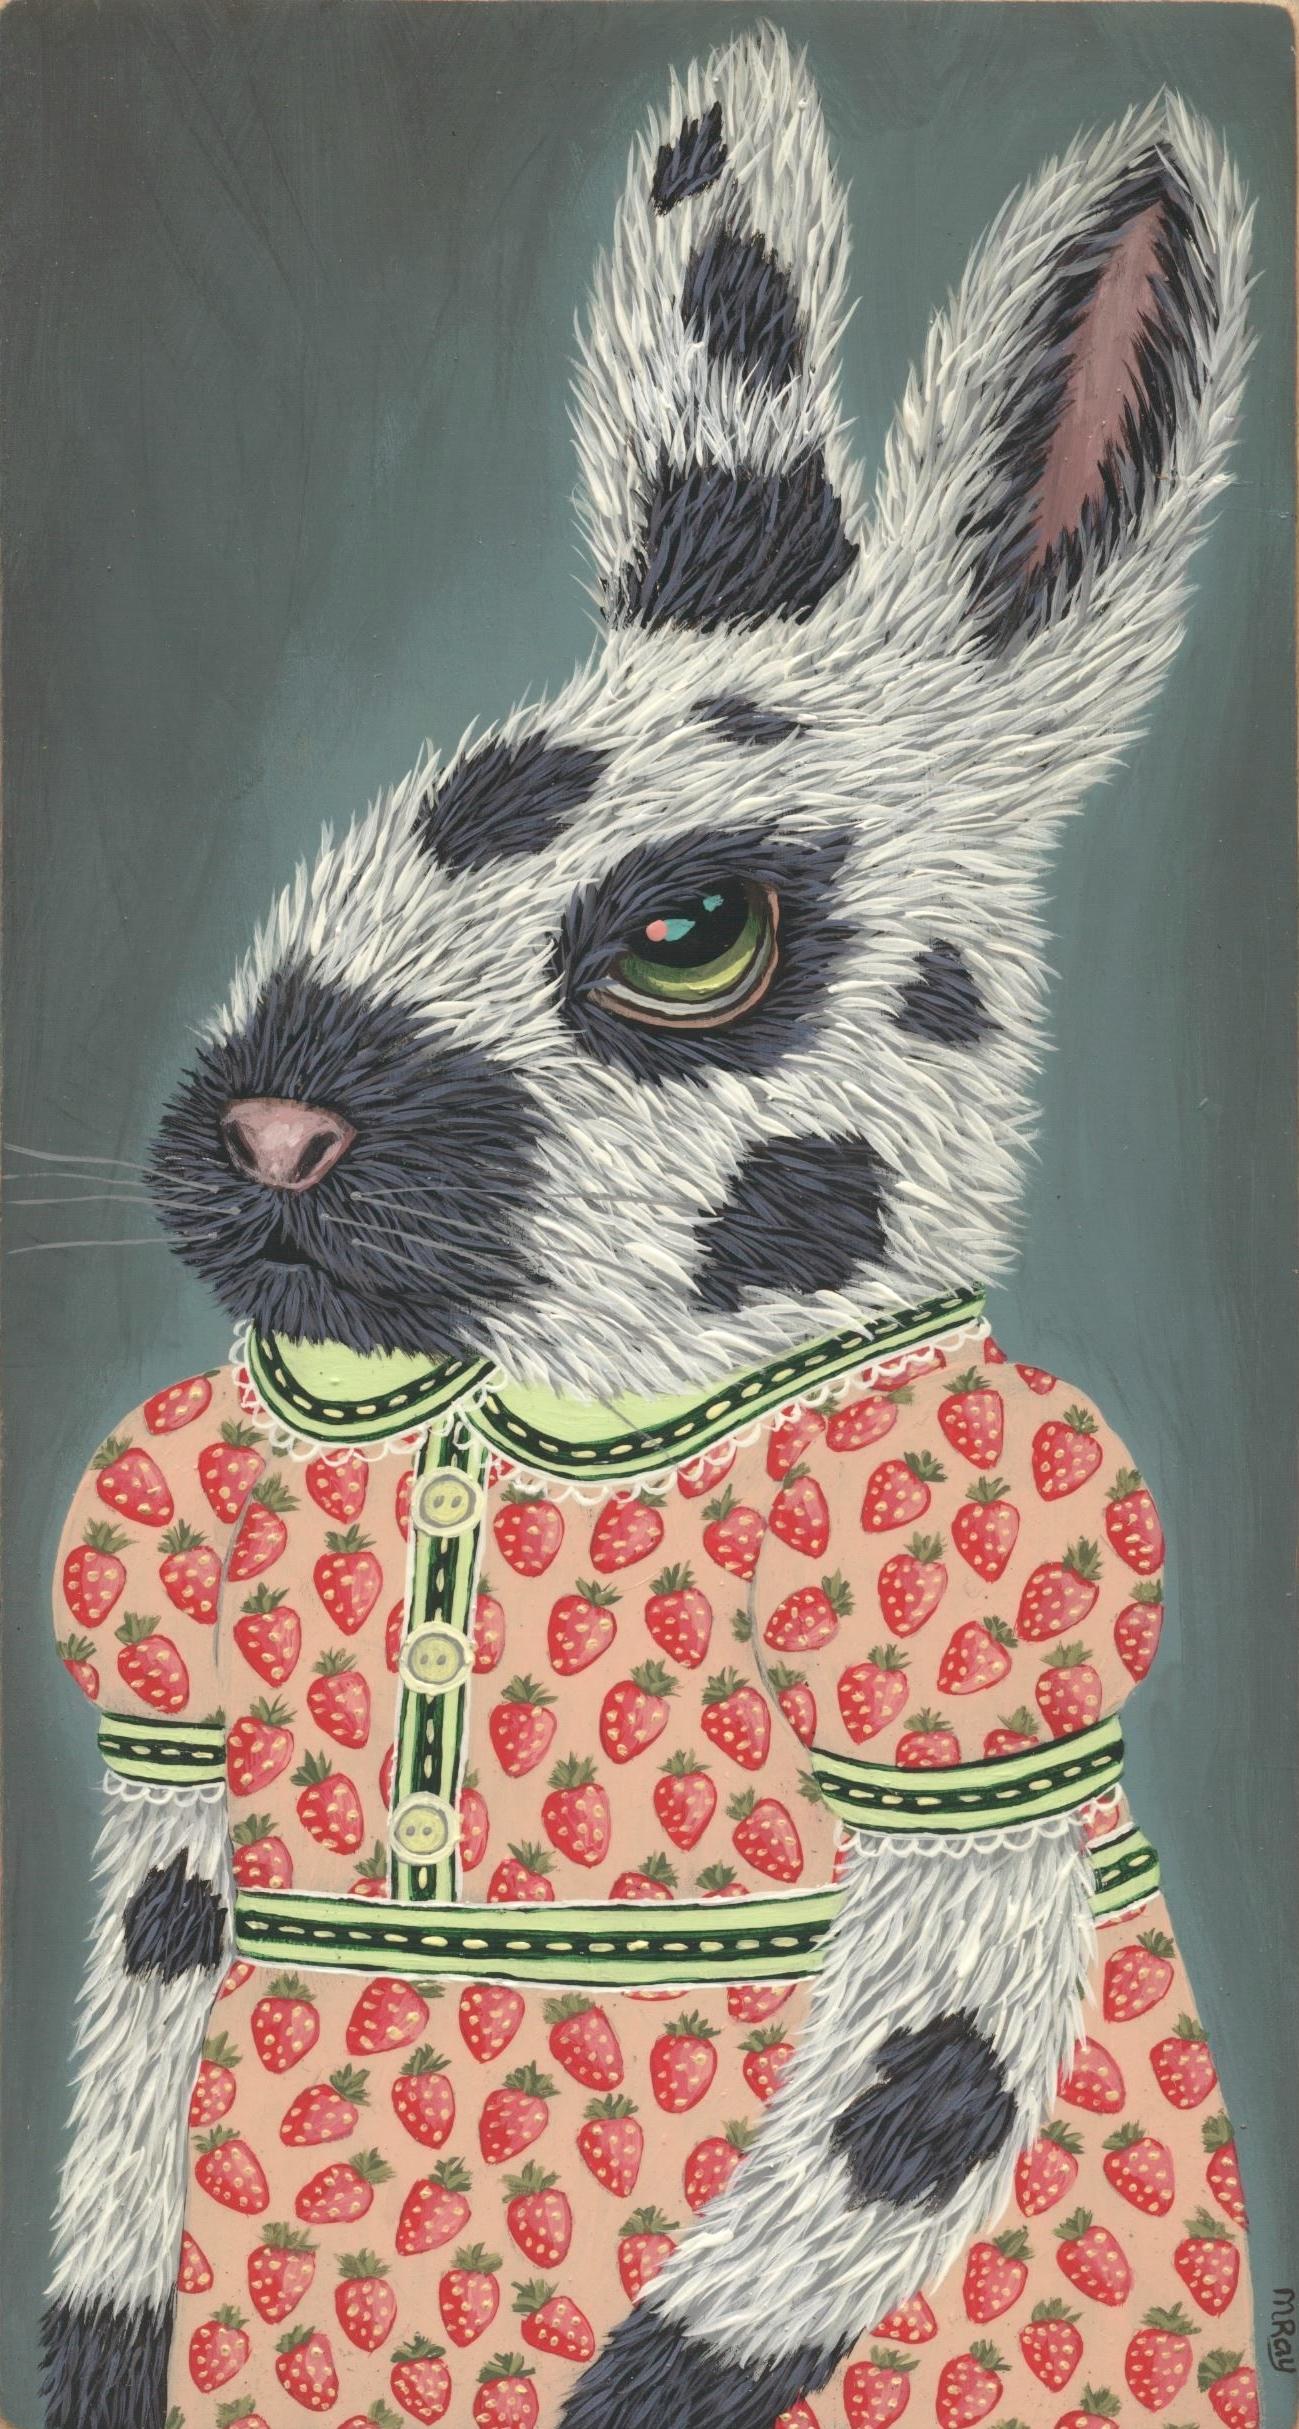 Bunny Dress #2